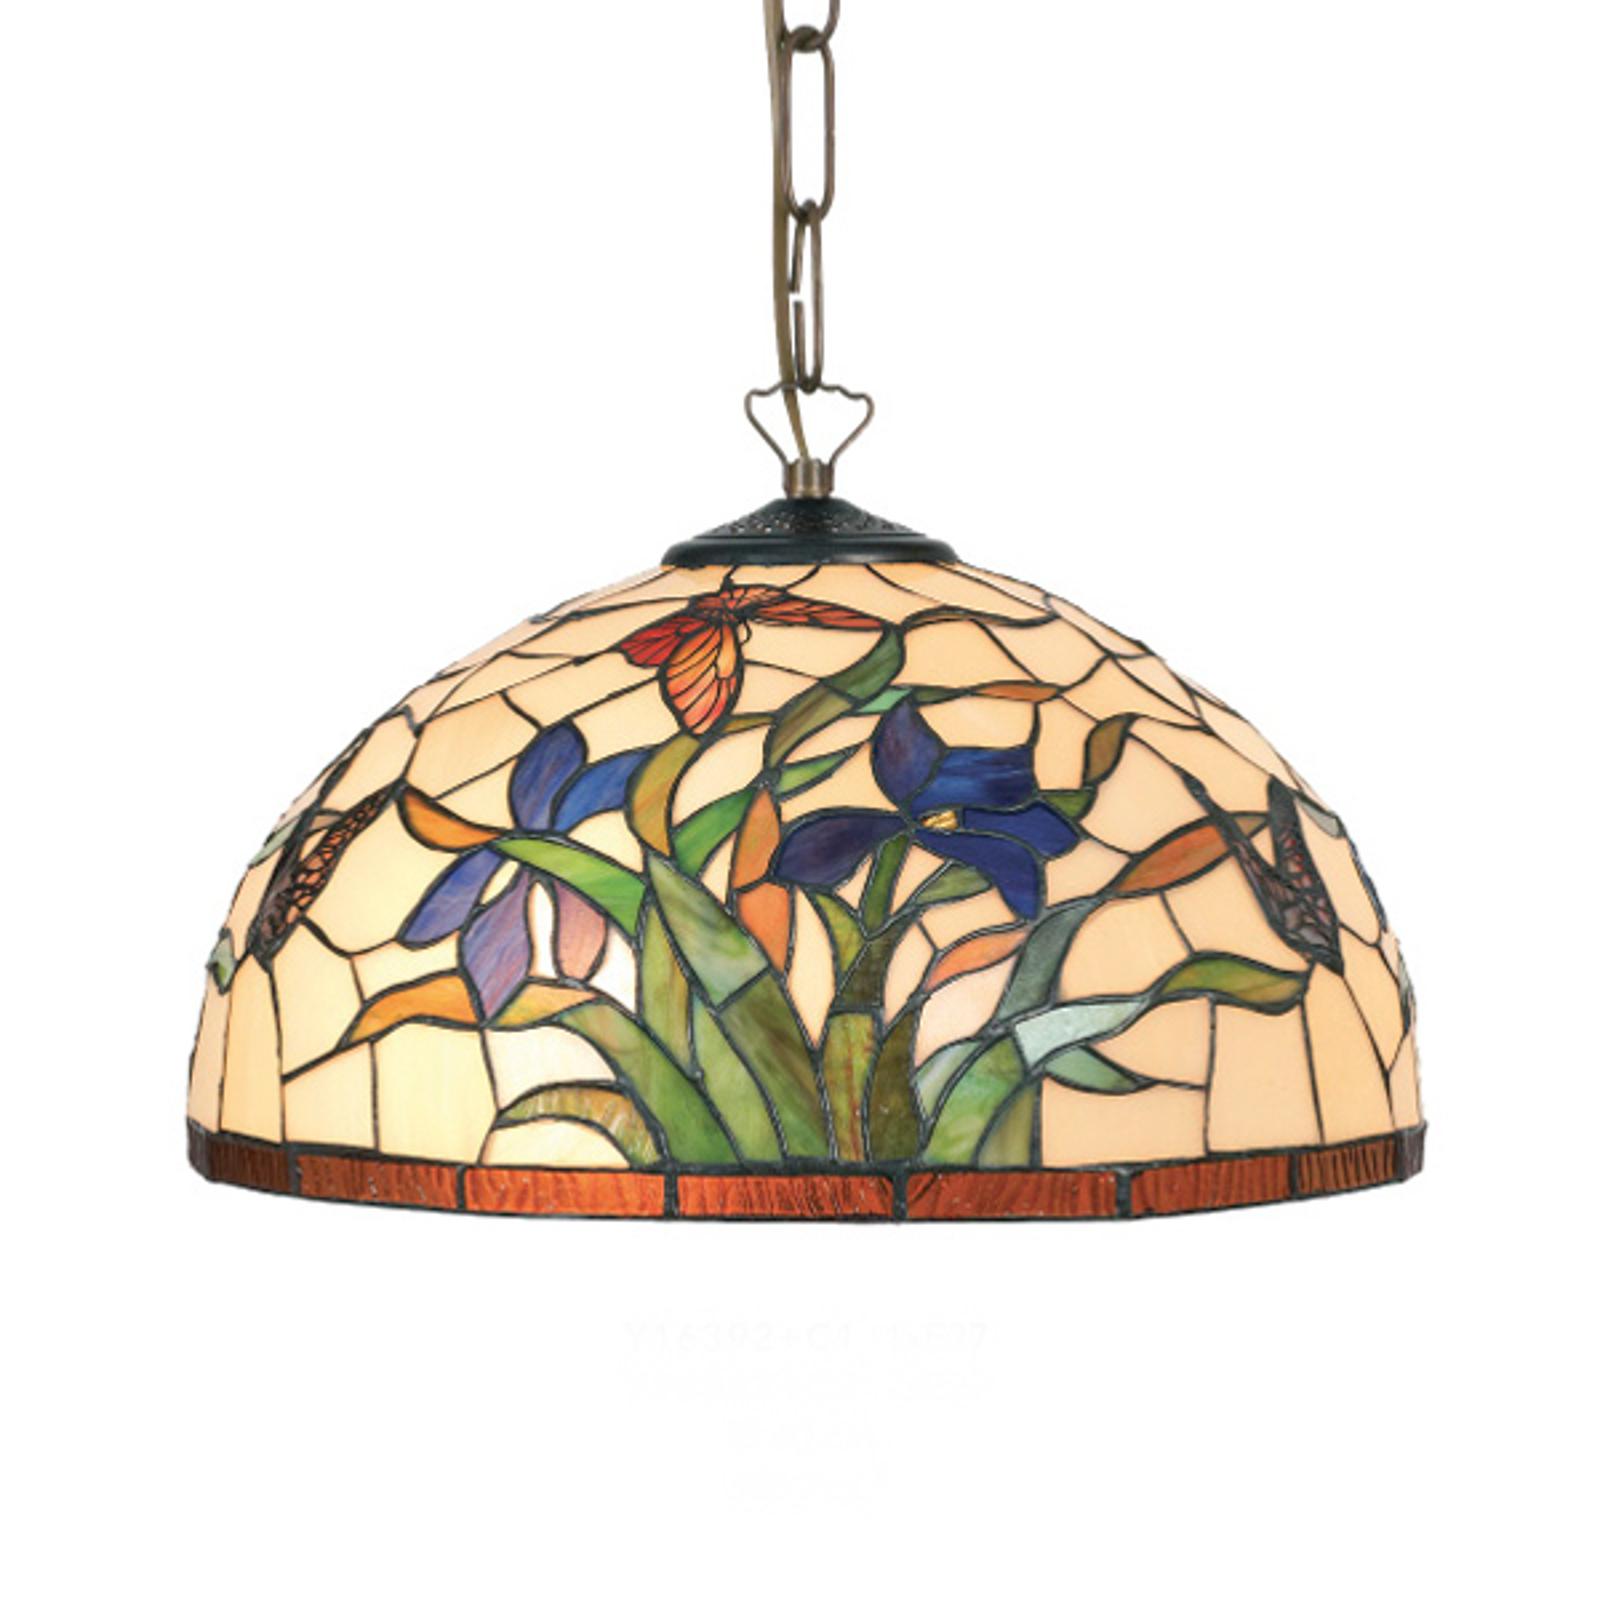 Suspension Elanda style Tiffany à 2 lampes